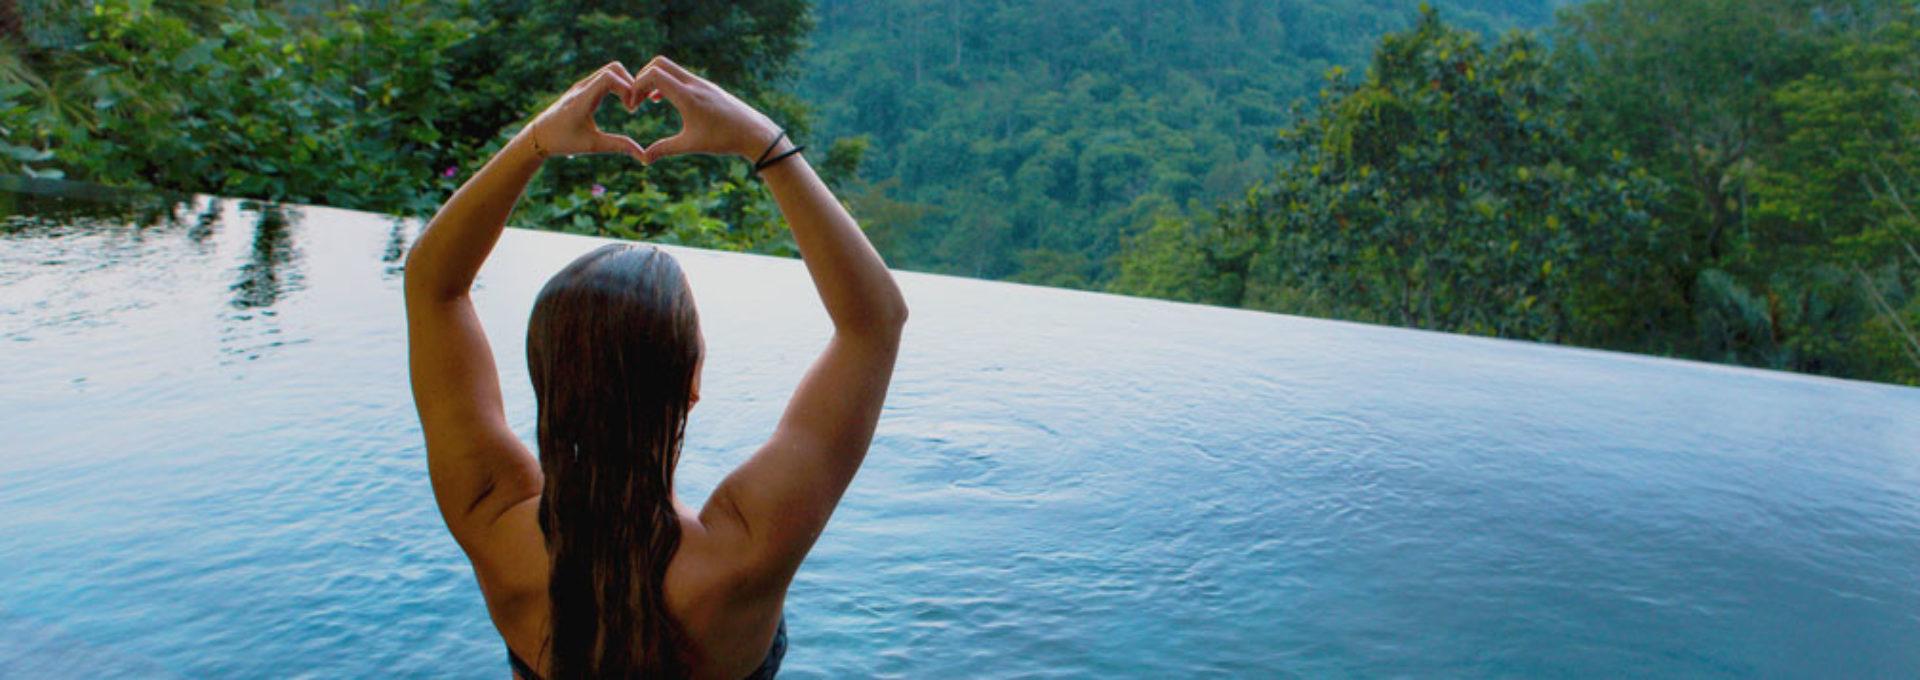 Best Spiritual Retreats and Wellness Vacation Packages - TaoWander